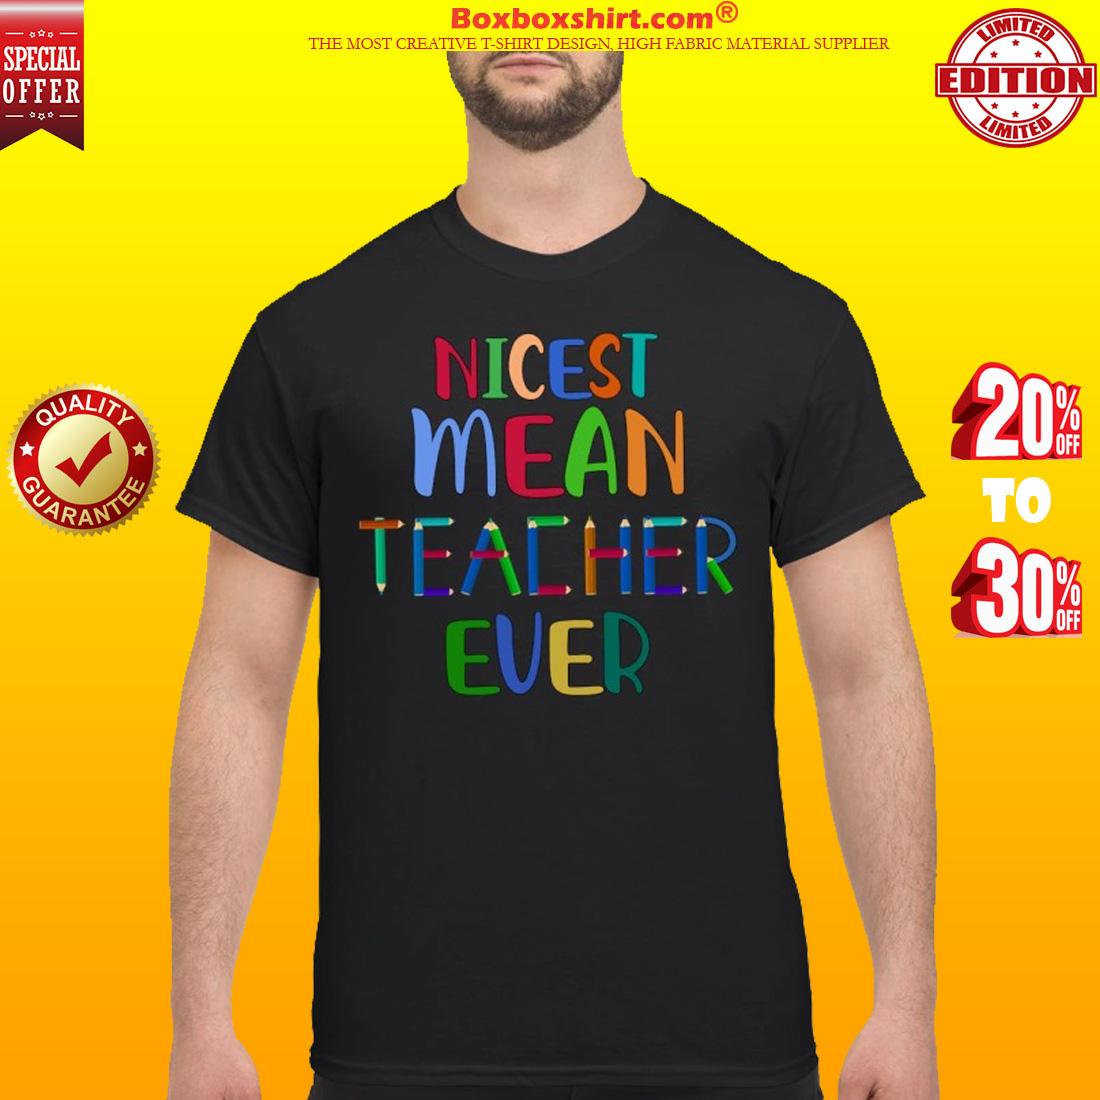 Nicest mean teacher ever classic shirt